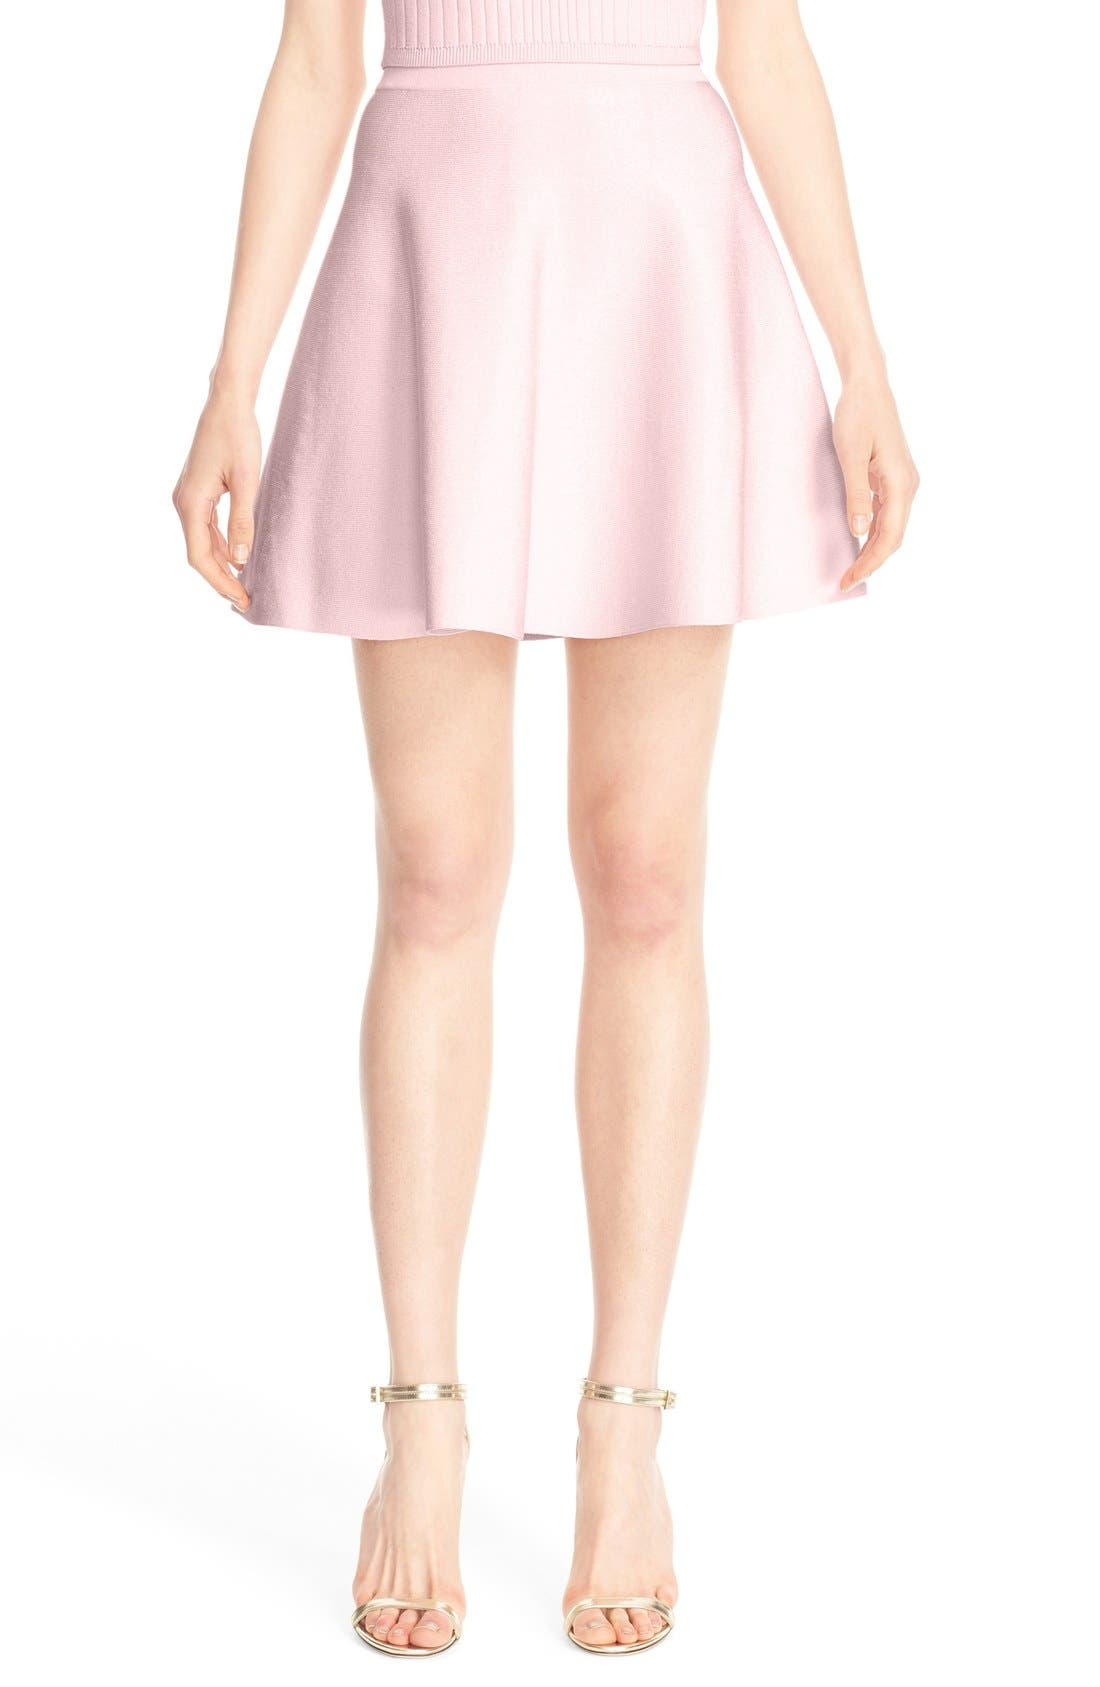 Alternate Image 1 Selected - Cushnie et Ochs Knit Circle Cut Miniskirt